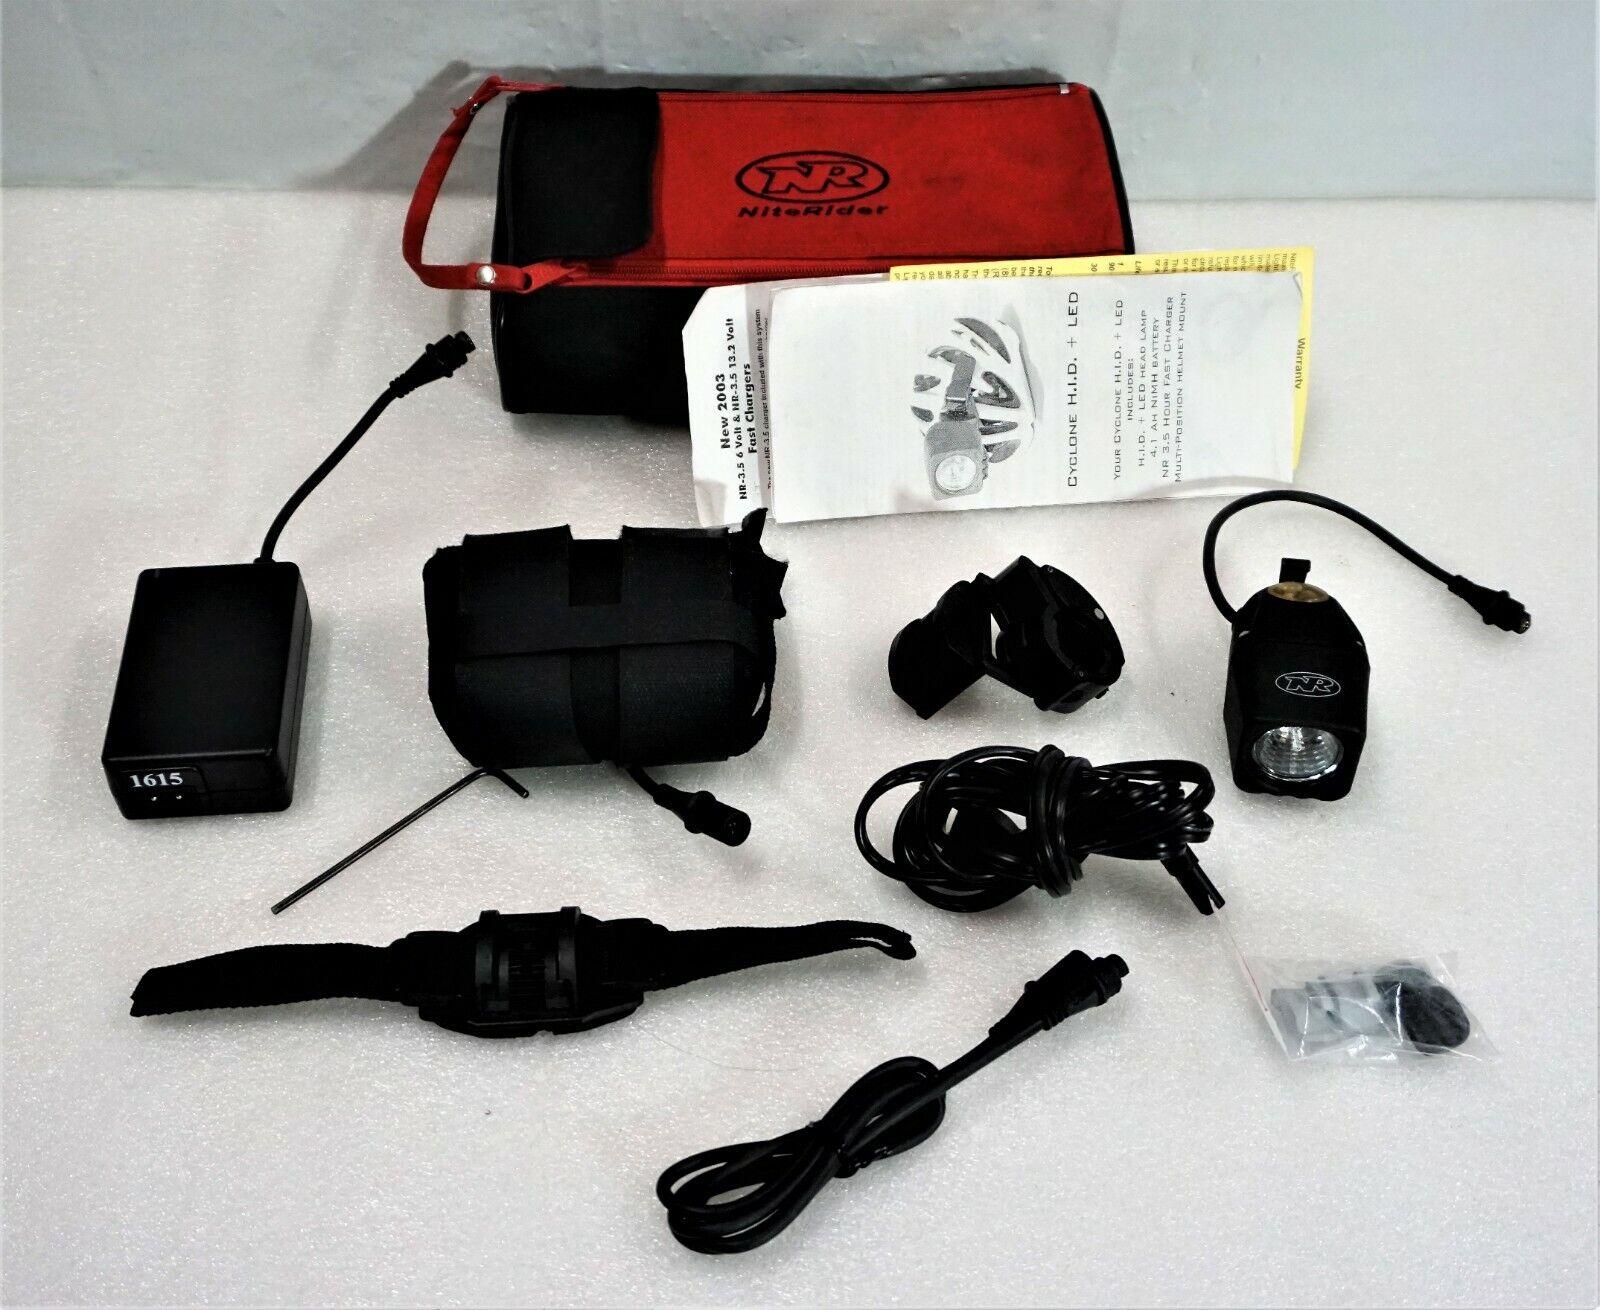 NiteRider Cyclone H.i.d. + LED luz estroboscópica Seguridad Casco de bicicleta como-es